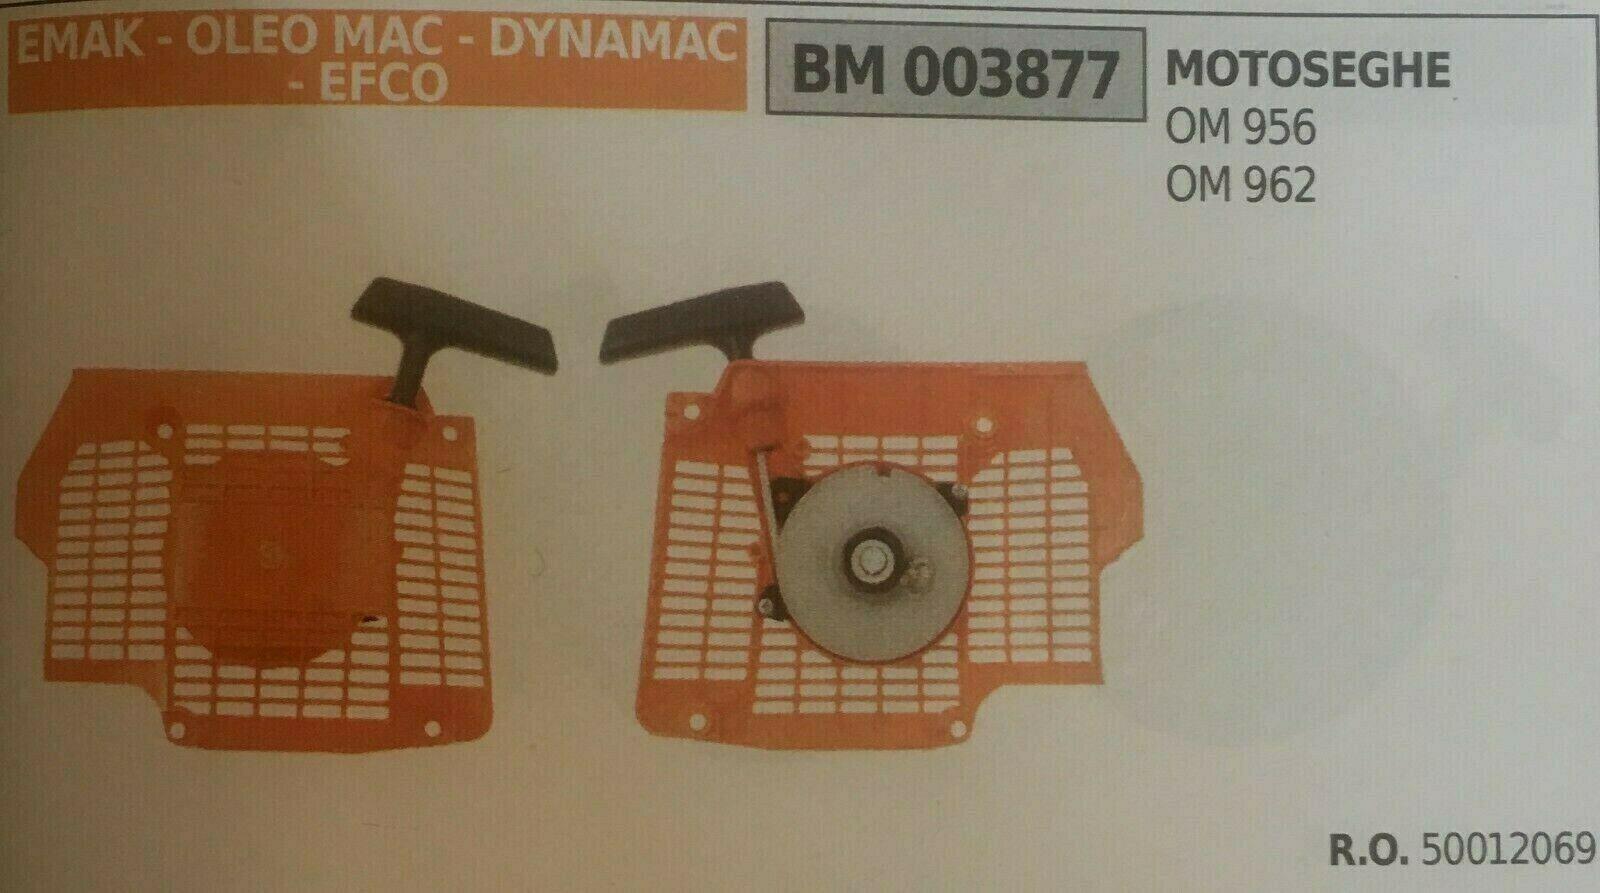 Start Komplett Brumar Emak - Oleo Mac - Dynamac - Efco BM003877